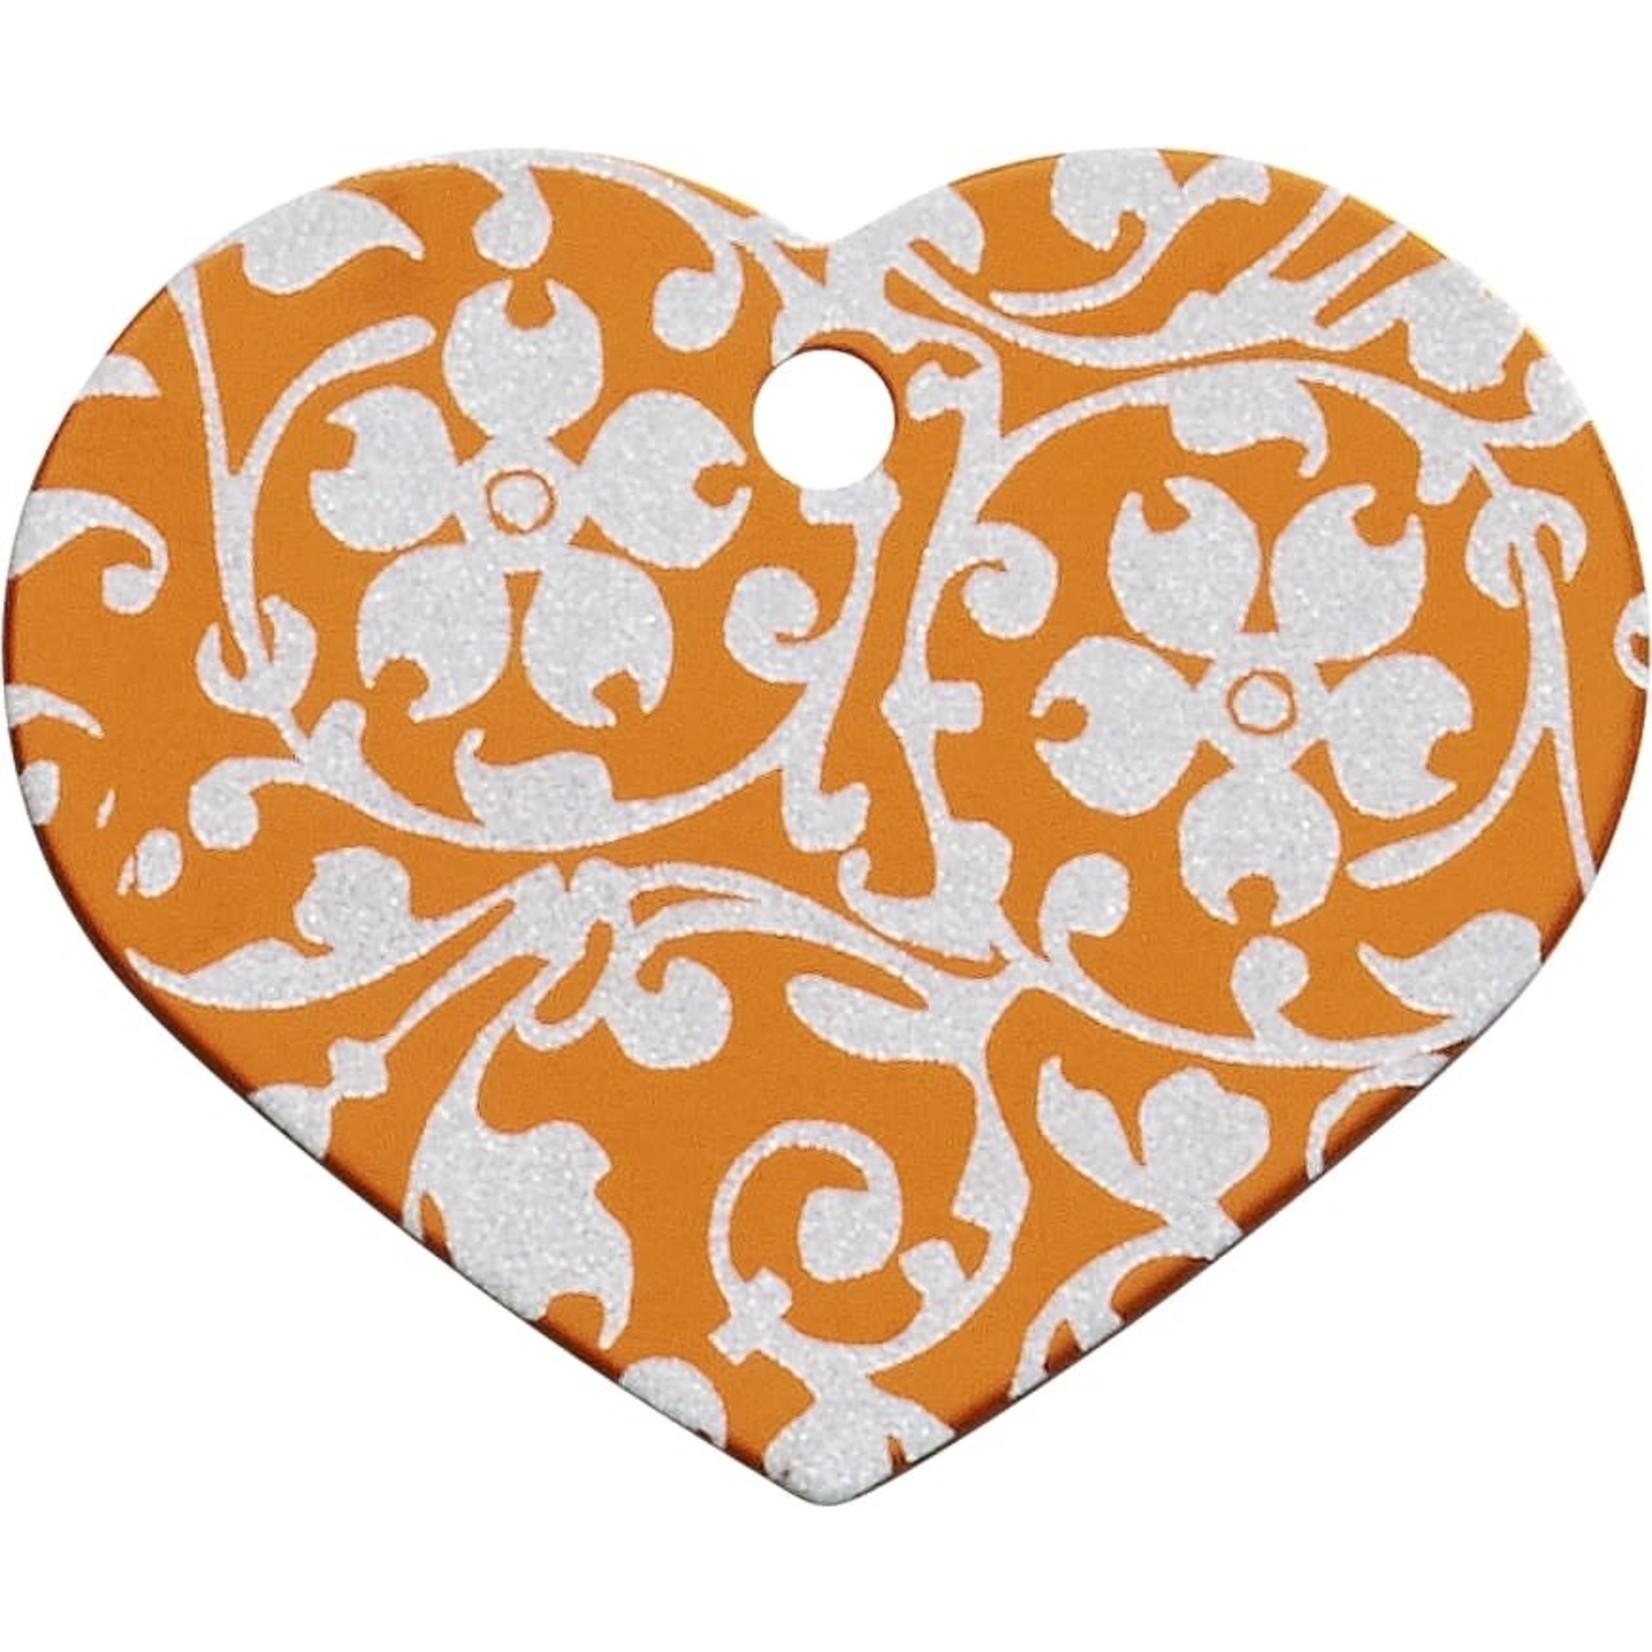 Smulders Diervoeders Penning Hartje Flower Oranje